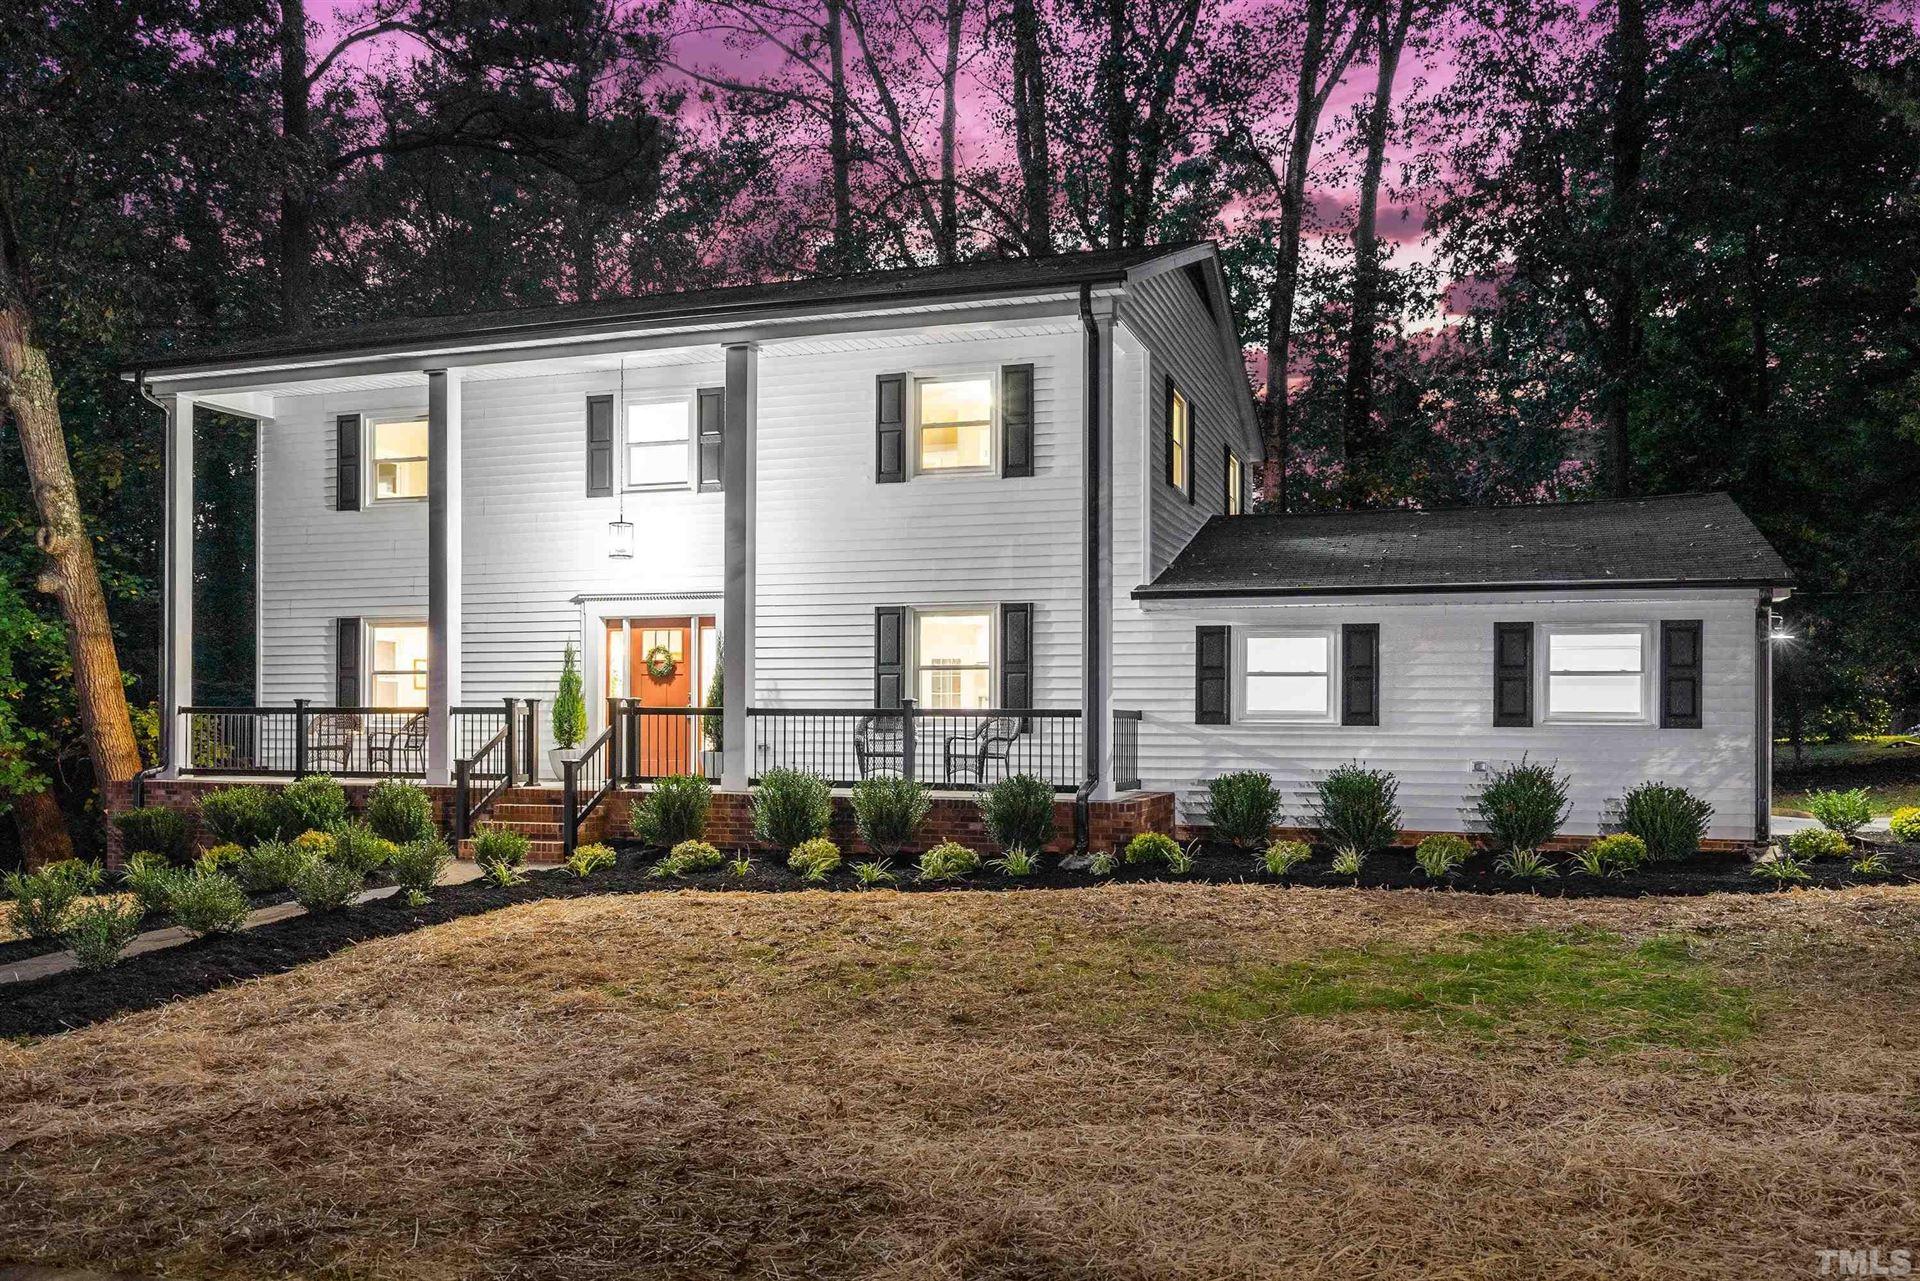 Photo of 4901 Quail Hollow, Raleigh, NC 27609 (MLS # 2408661)